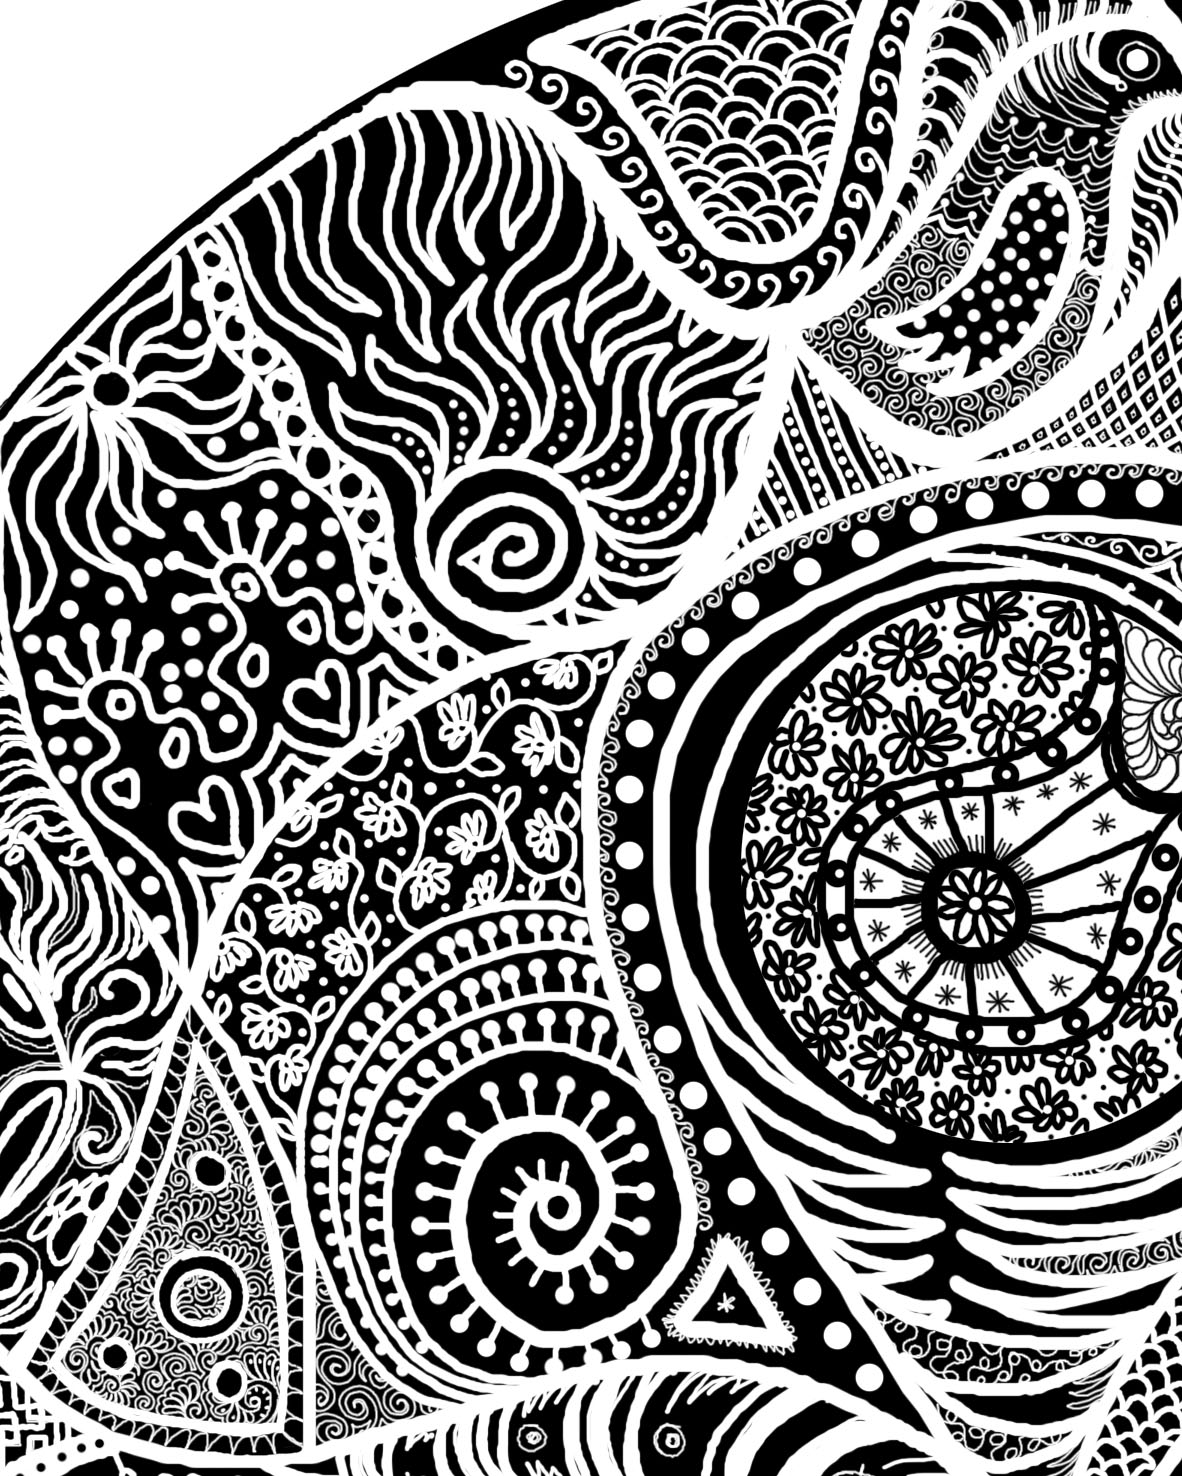 Doodle mandela carla barrett - Doodle dessin ...